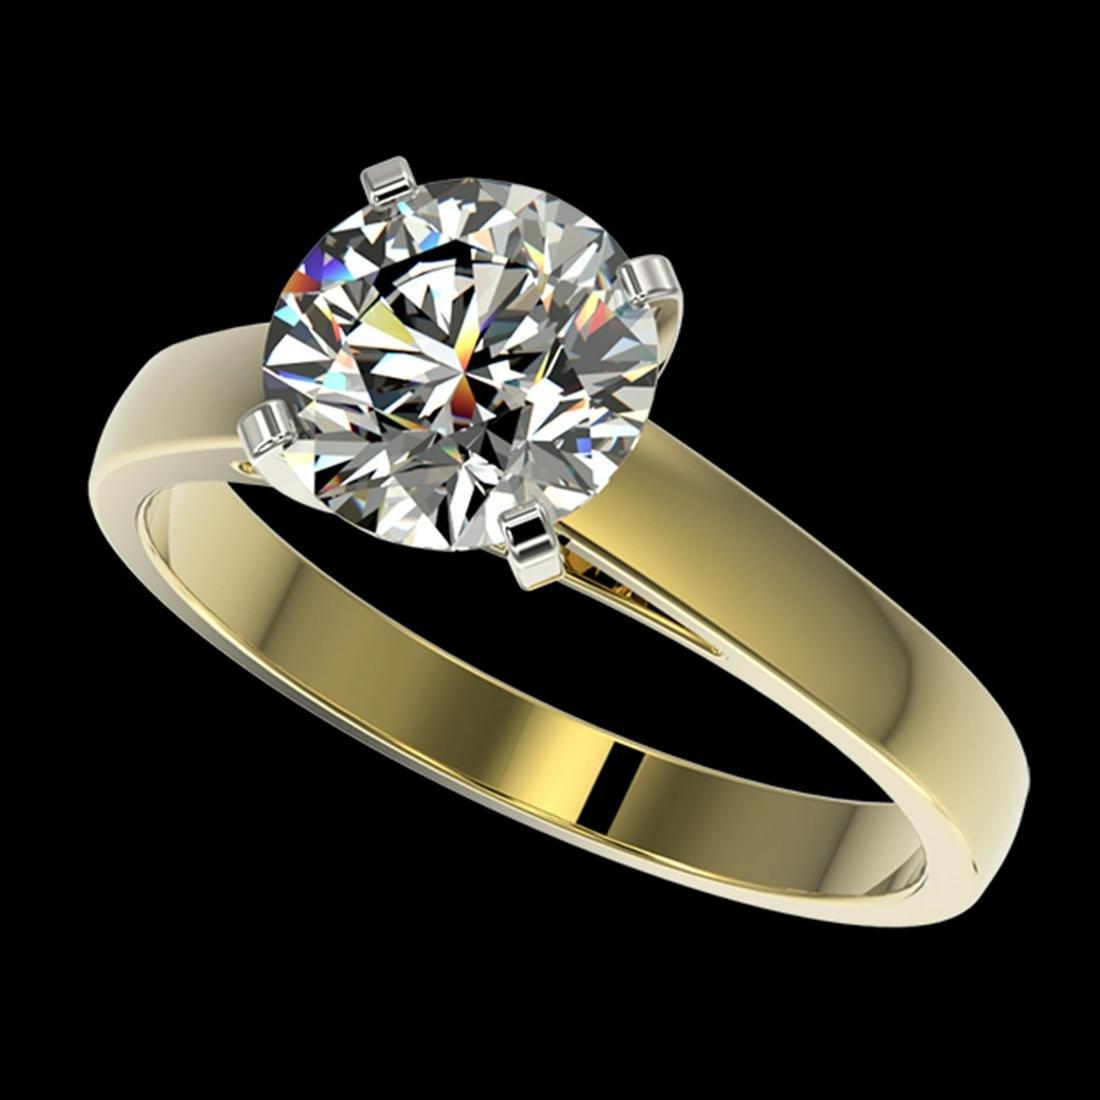 2.05 ctw H-SI/I Diamond Ring 10K Yellow Gold -